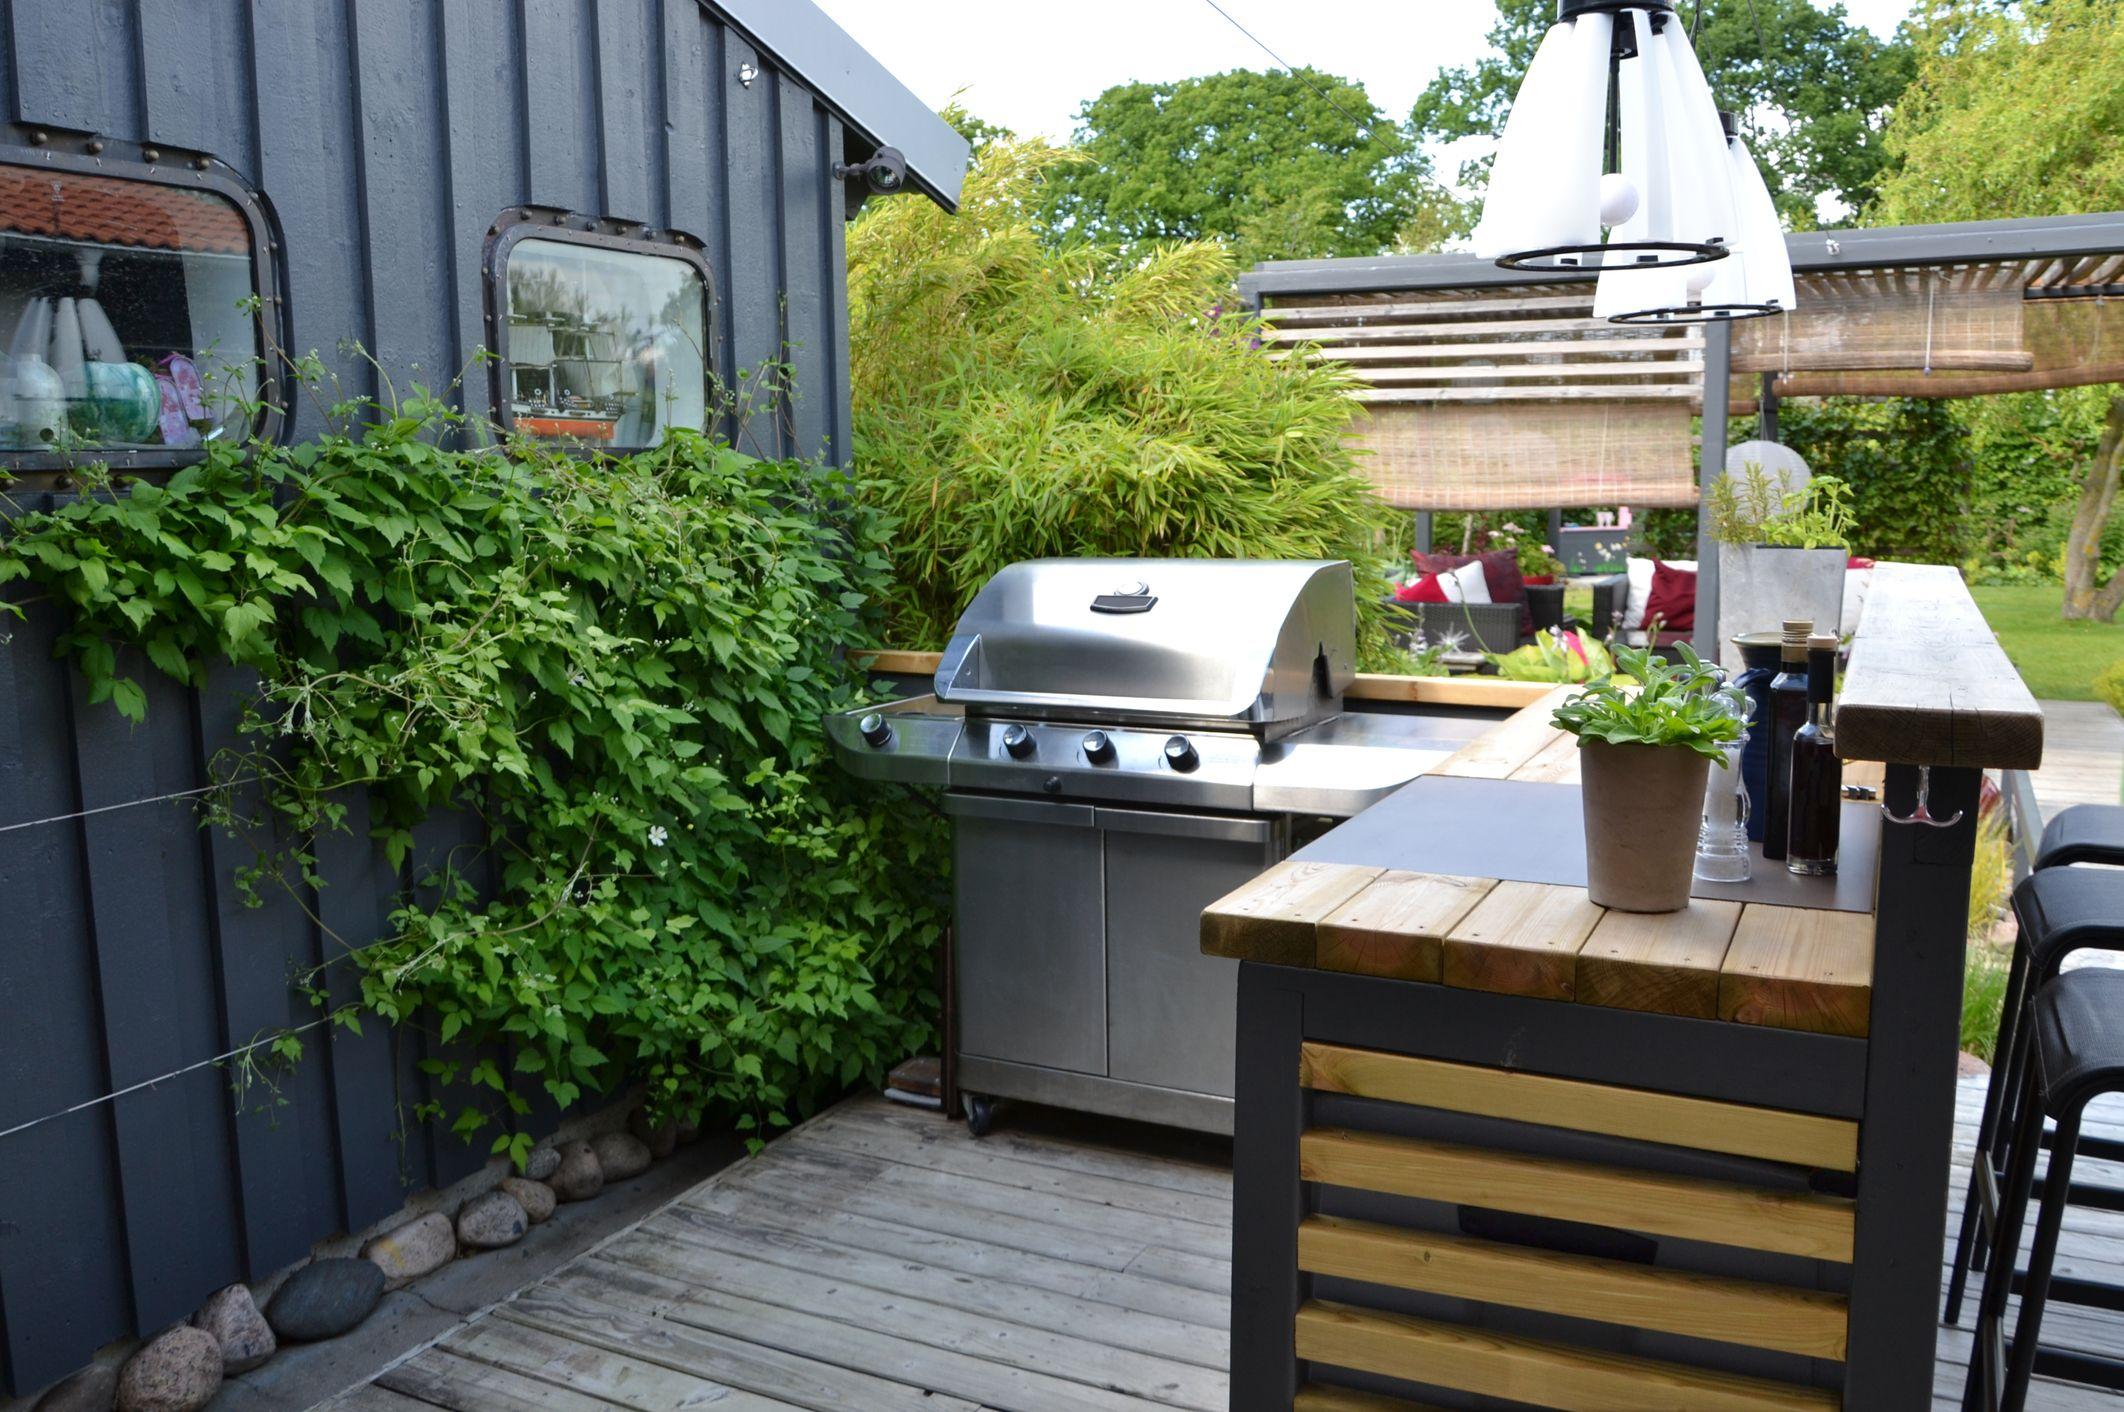 12 Best Outdoor Bar Ideas - DIY Outdoor Bars for Entertaining on Best Backyard Bars id=46872